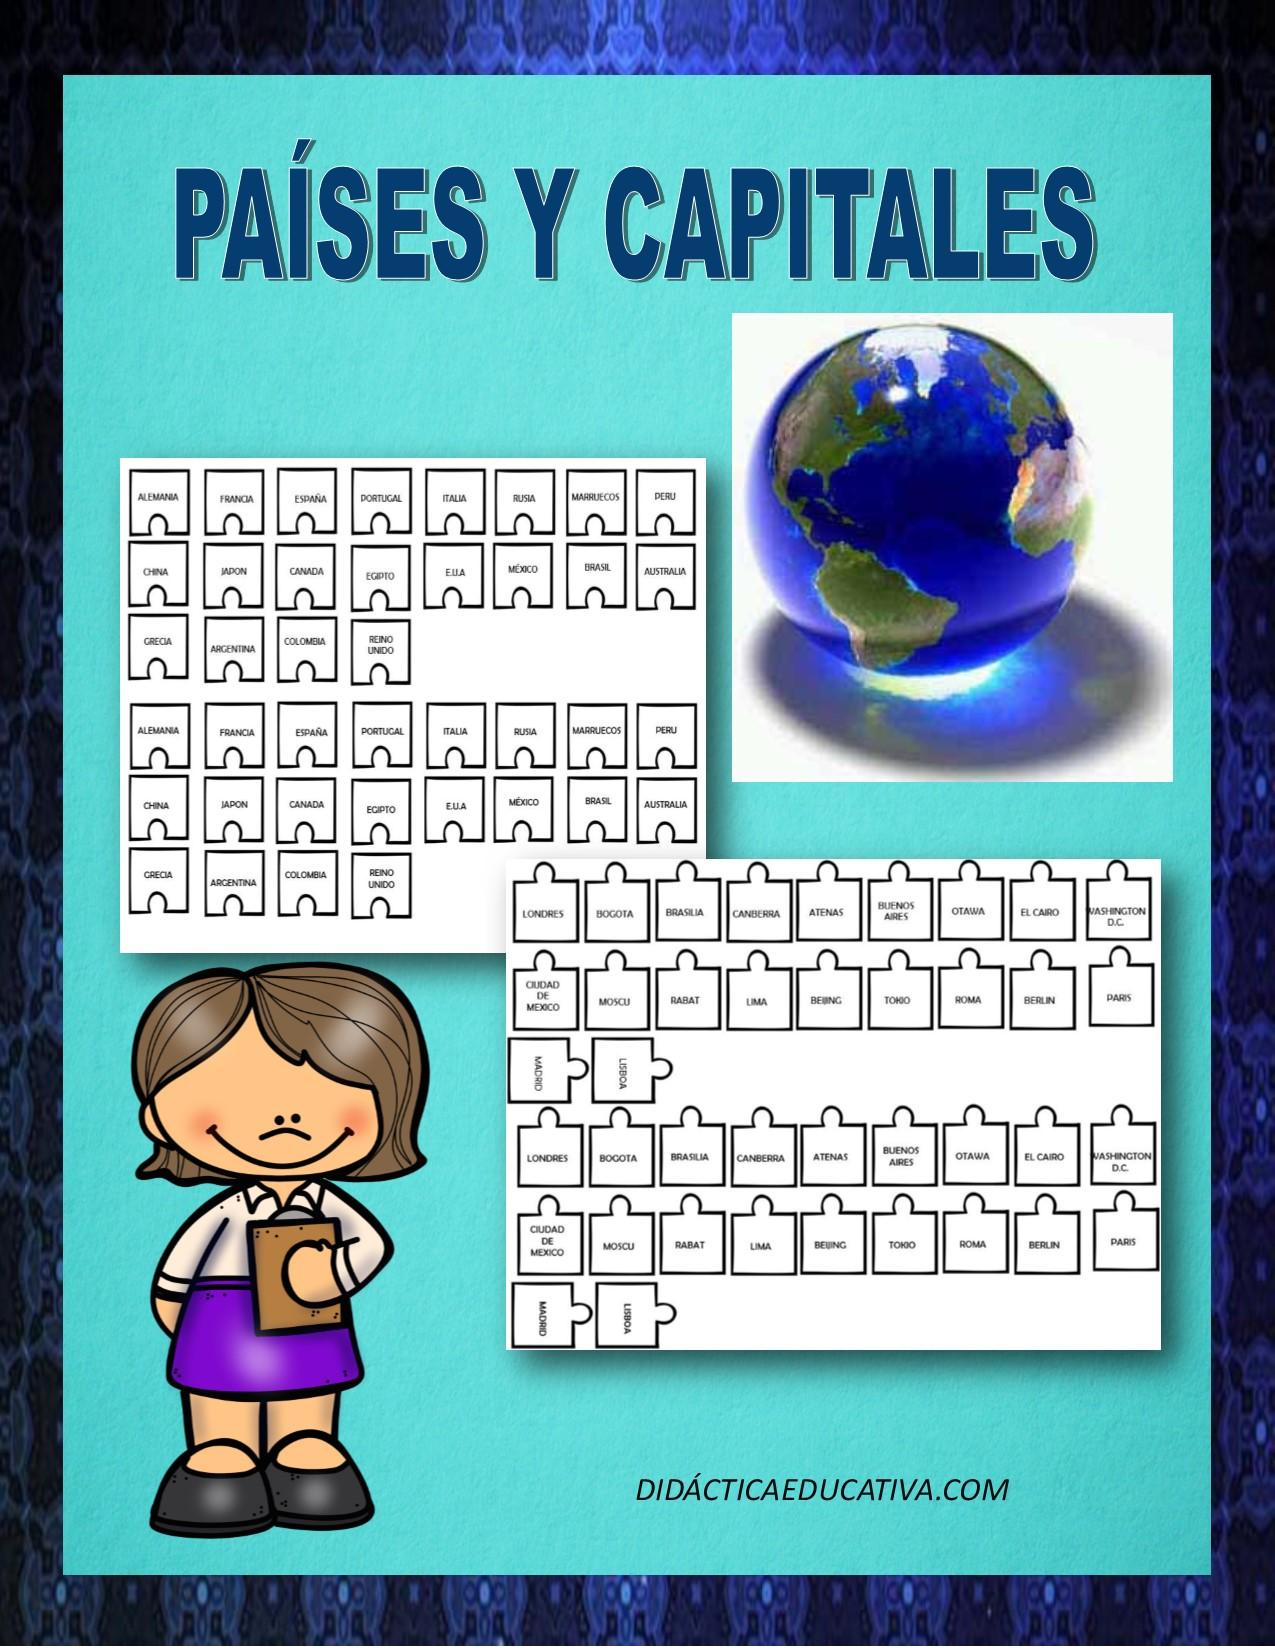 paises-y-capitales